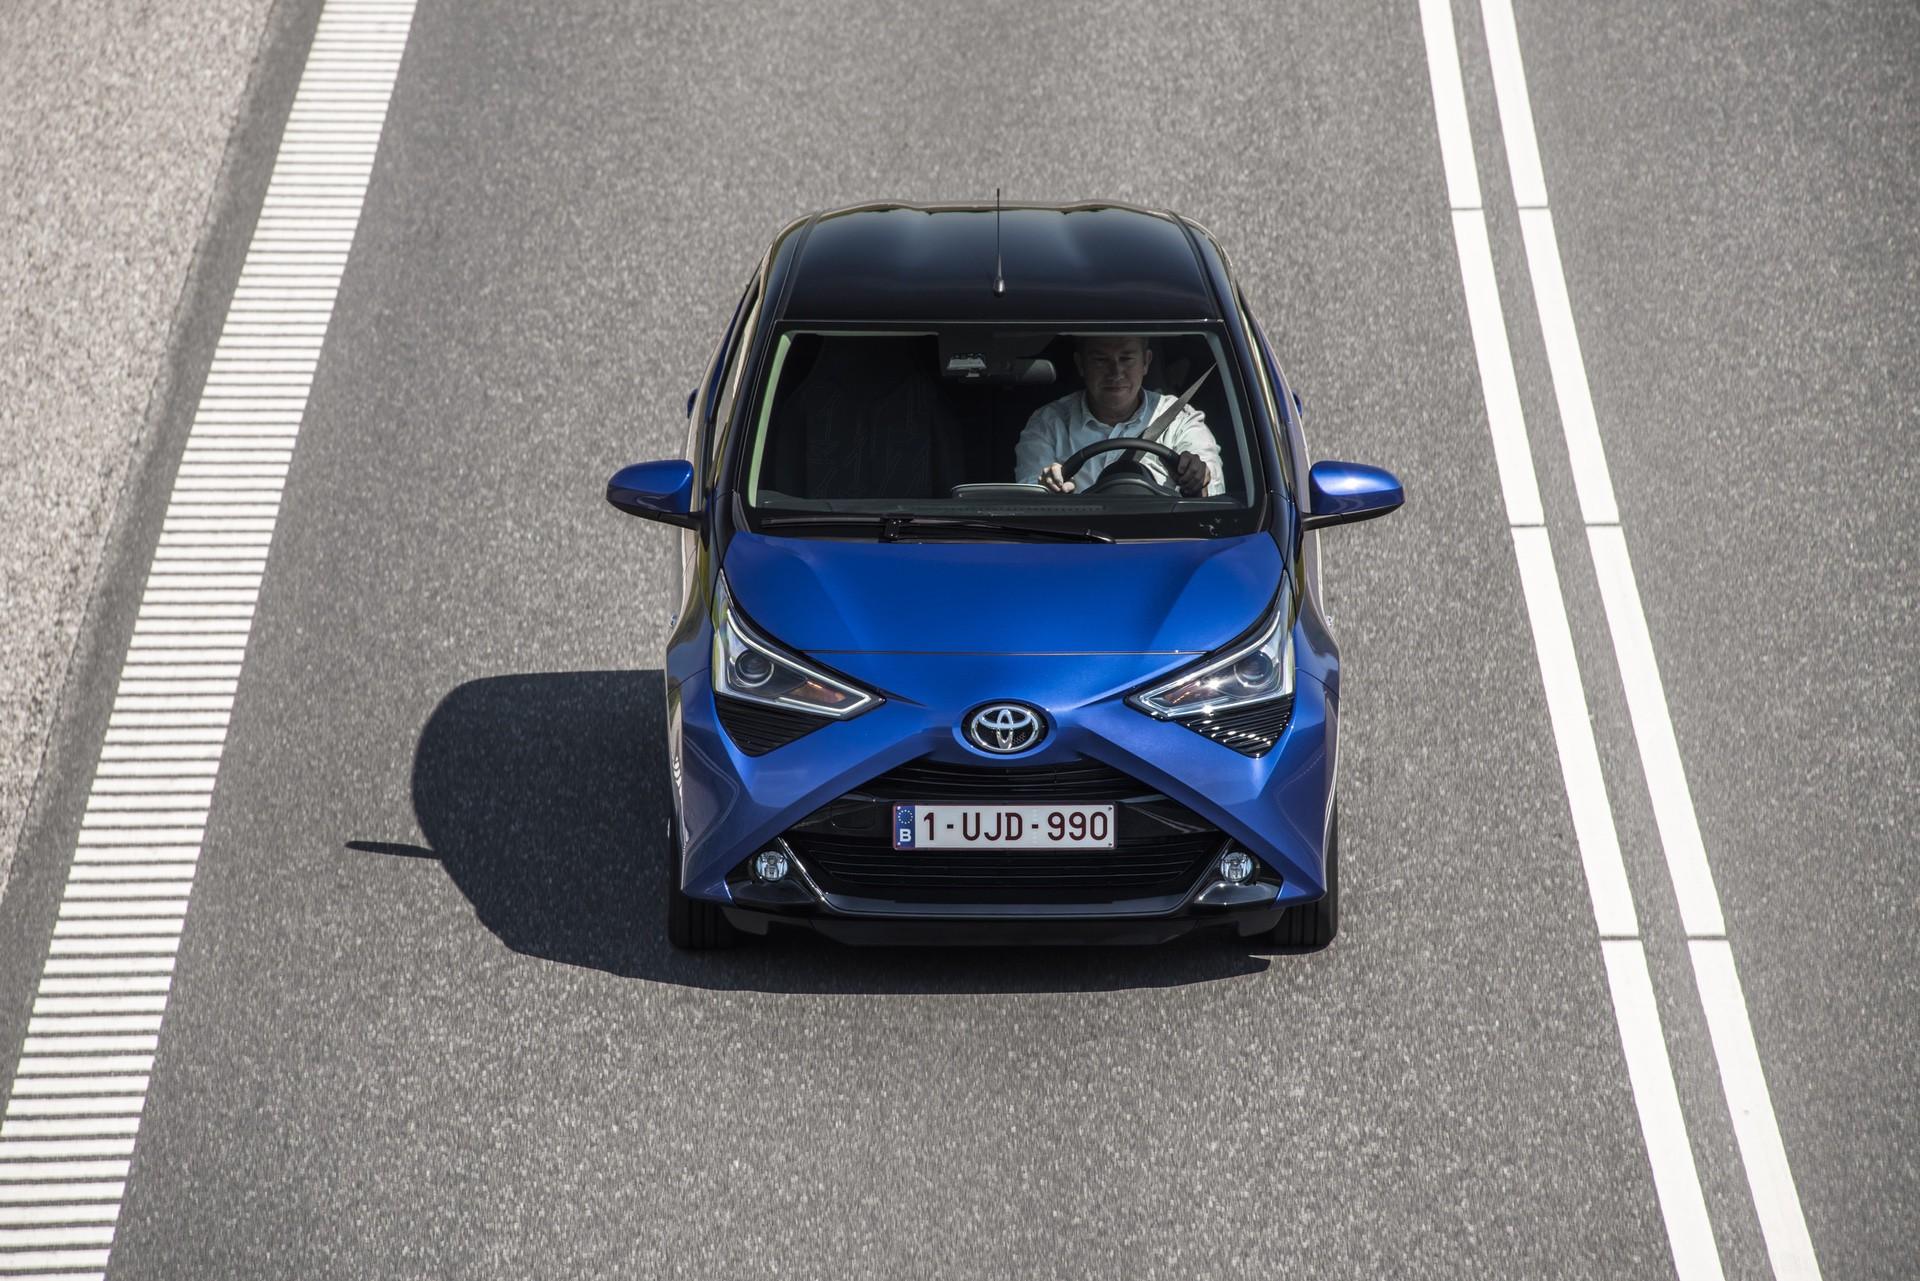 Toyota_Aygo_facelift_presskit_0001